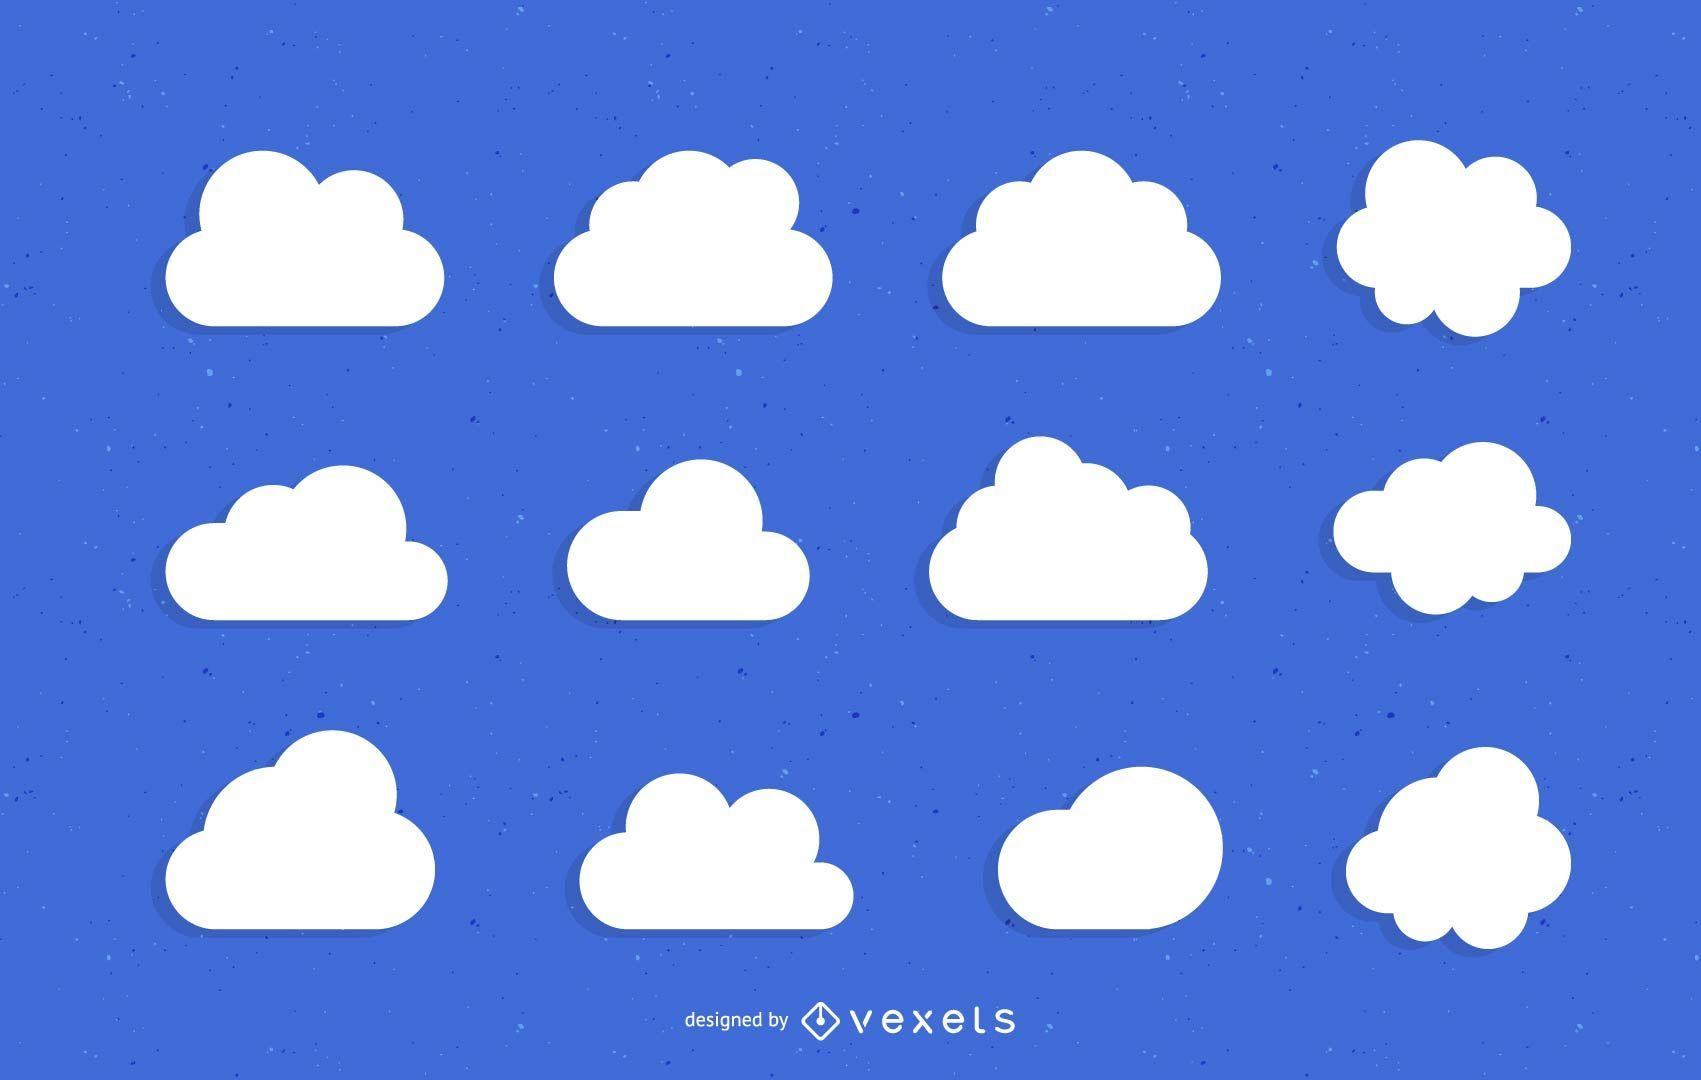 Minimalist clouds flat illustration set